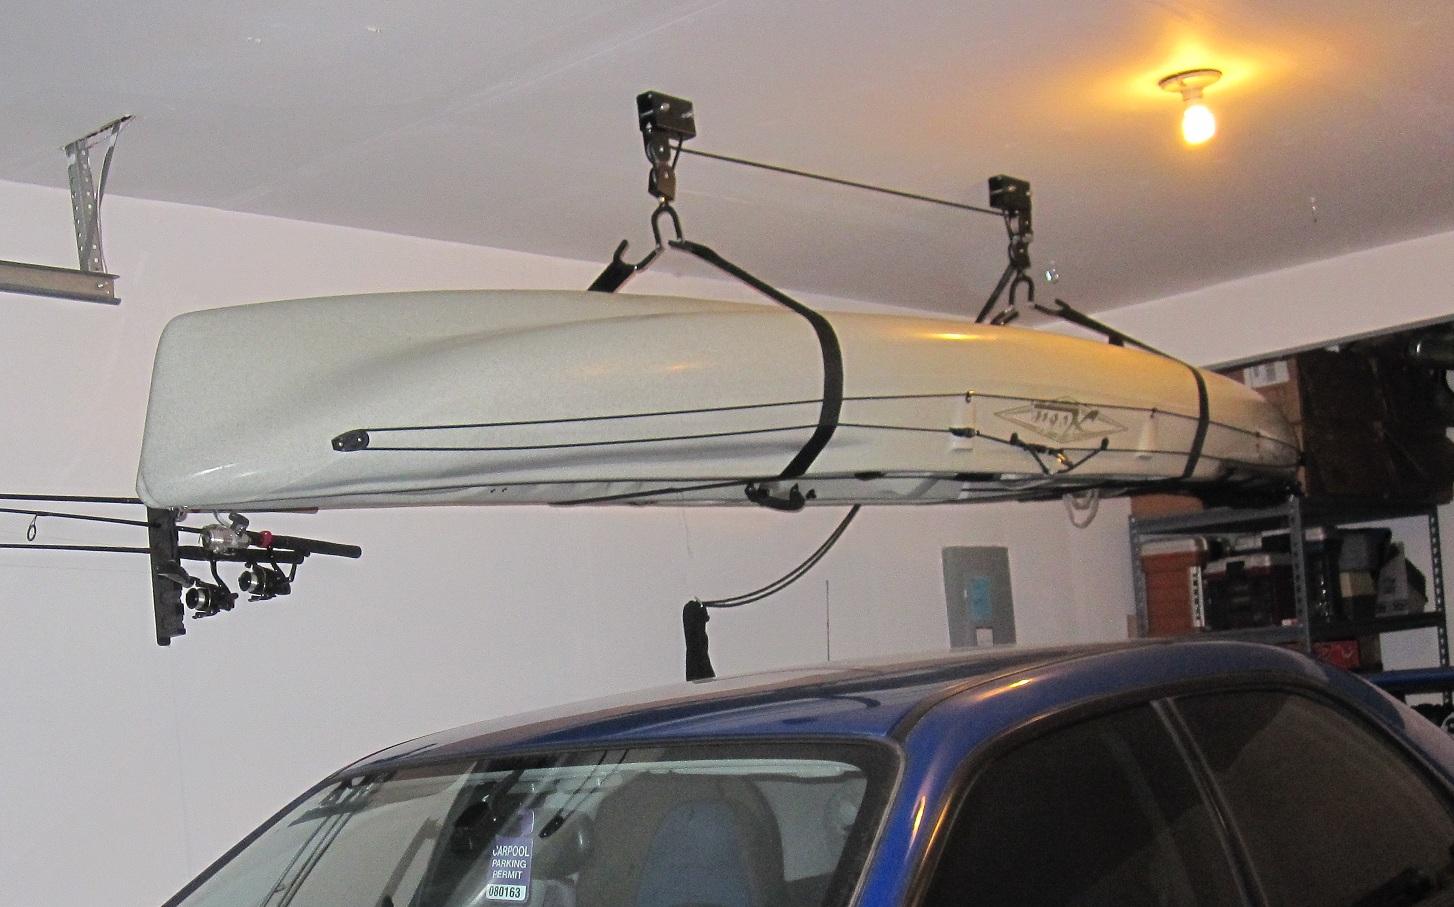 Canoe Storage Garage Ceiling Storage Pulley Hoist Up To 30